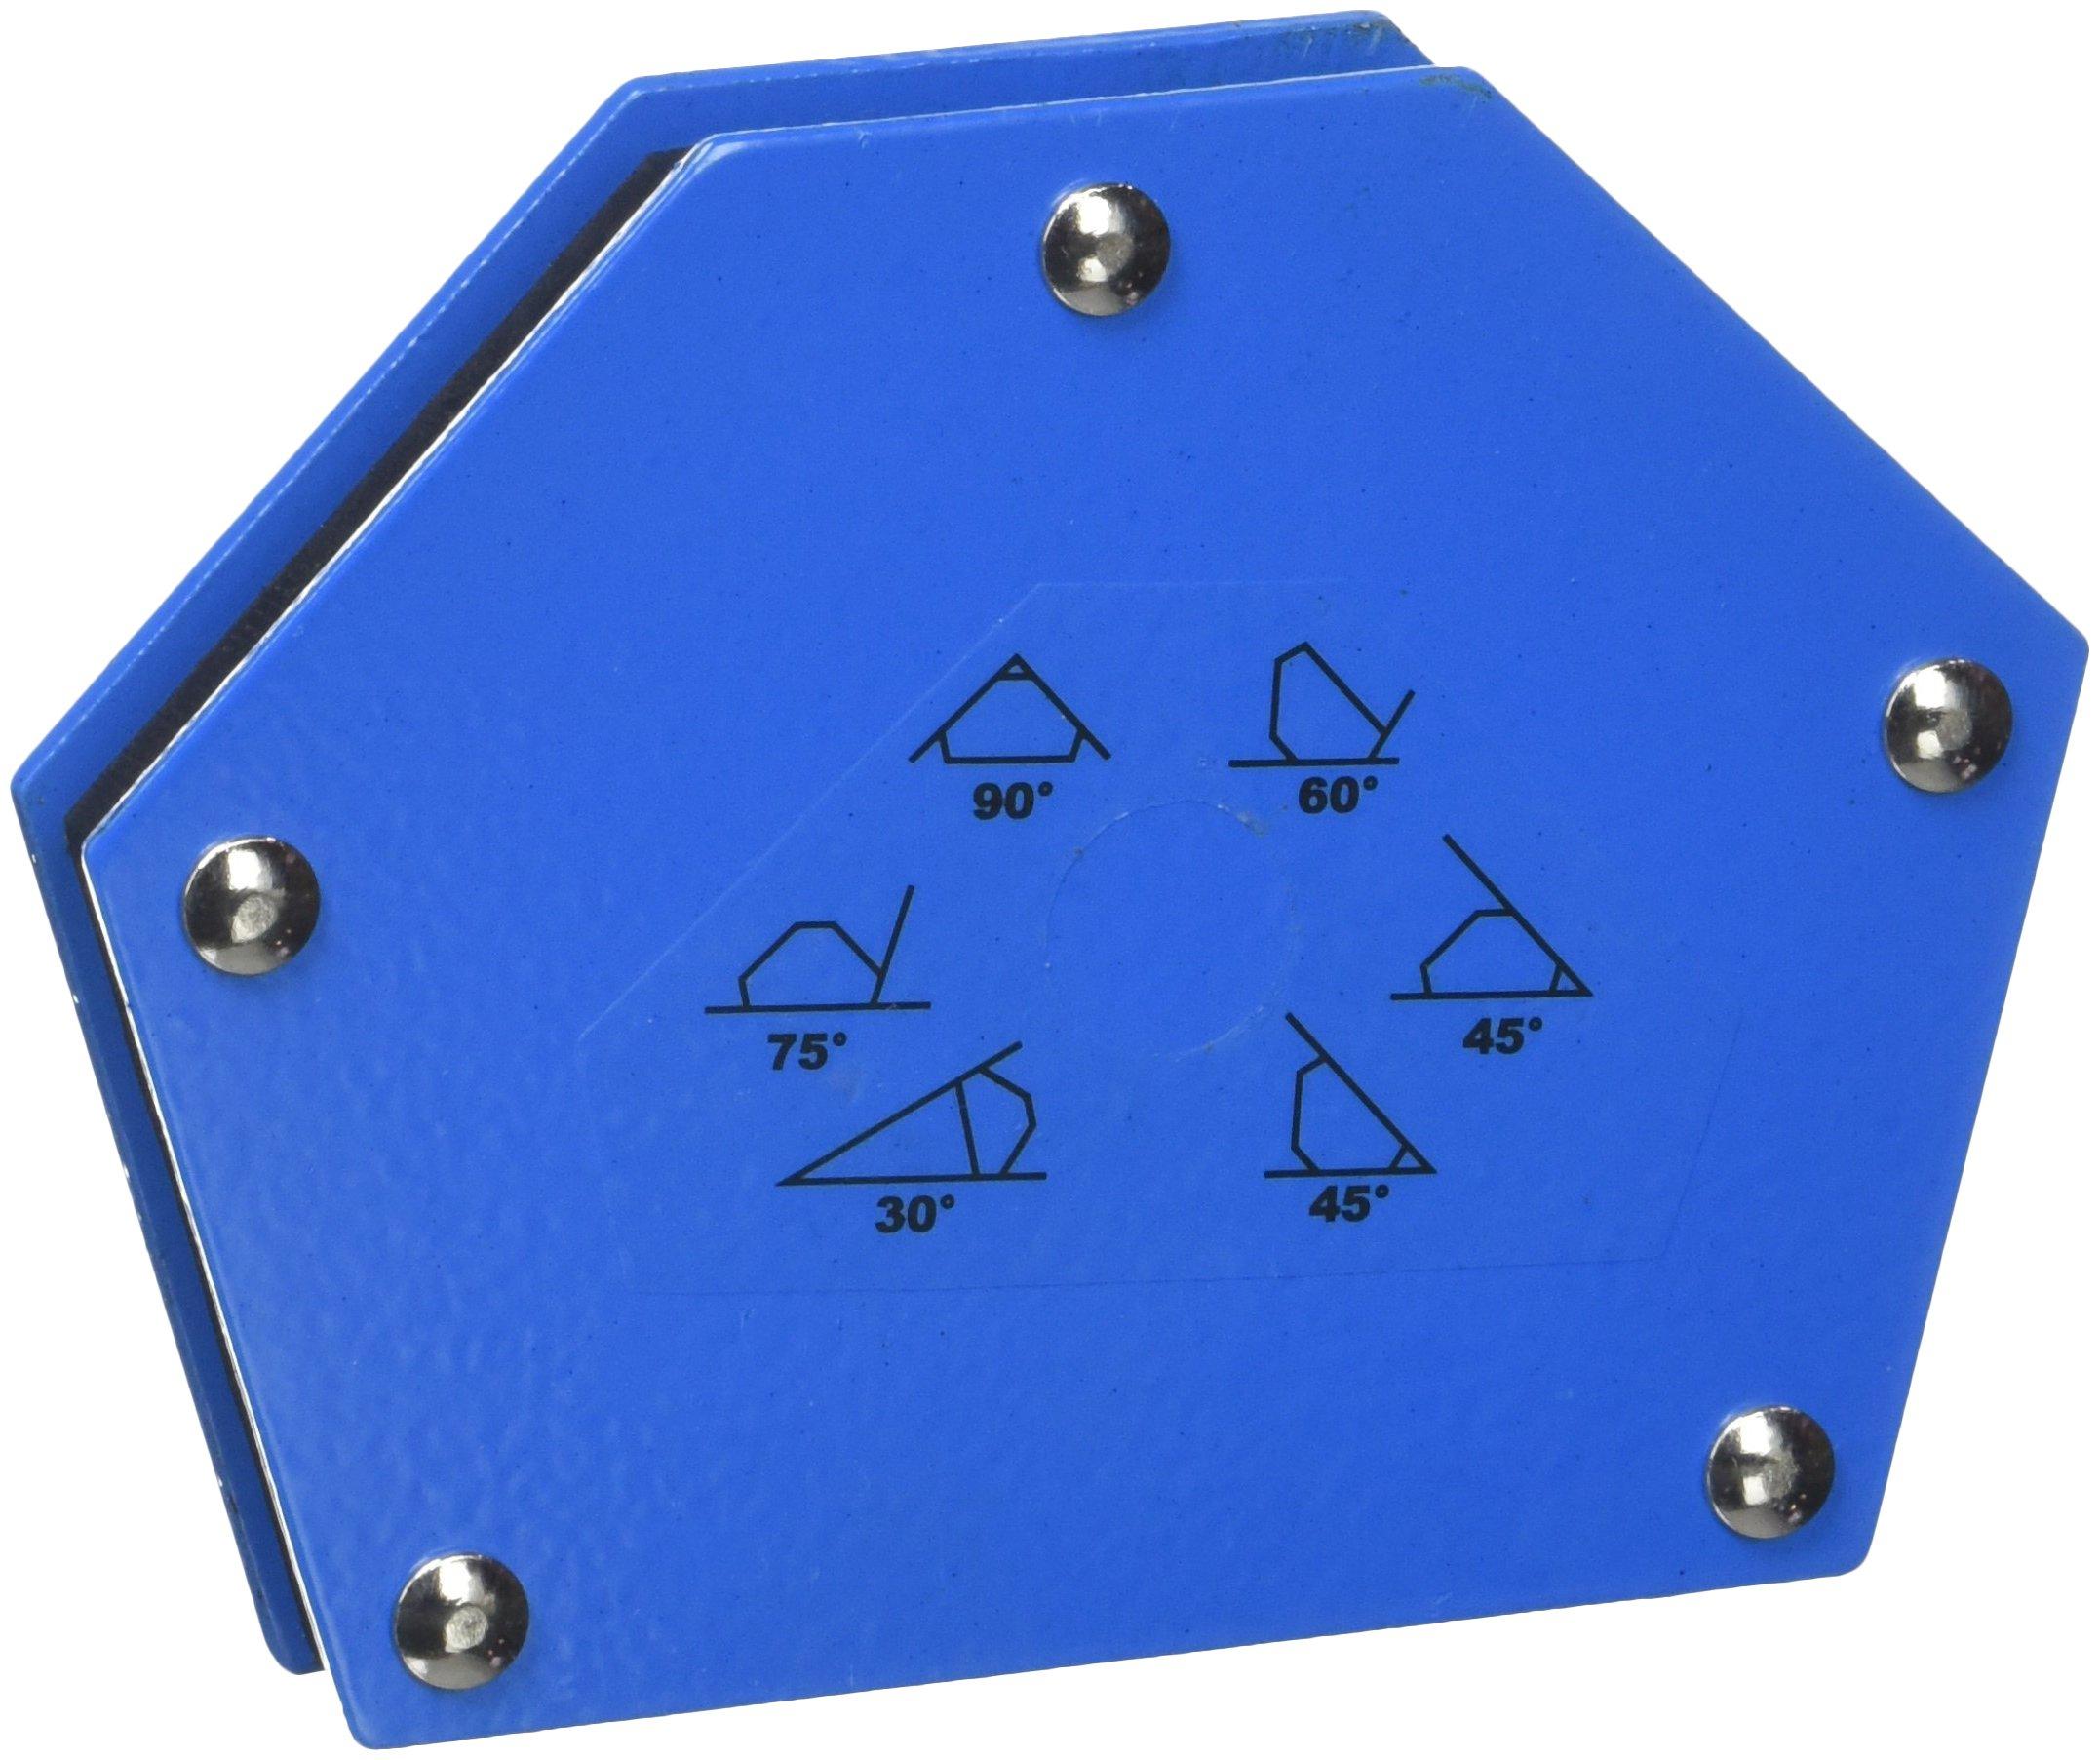 Silverline 148968 - Escuadra magnética para soldar (18 kg) product image